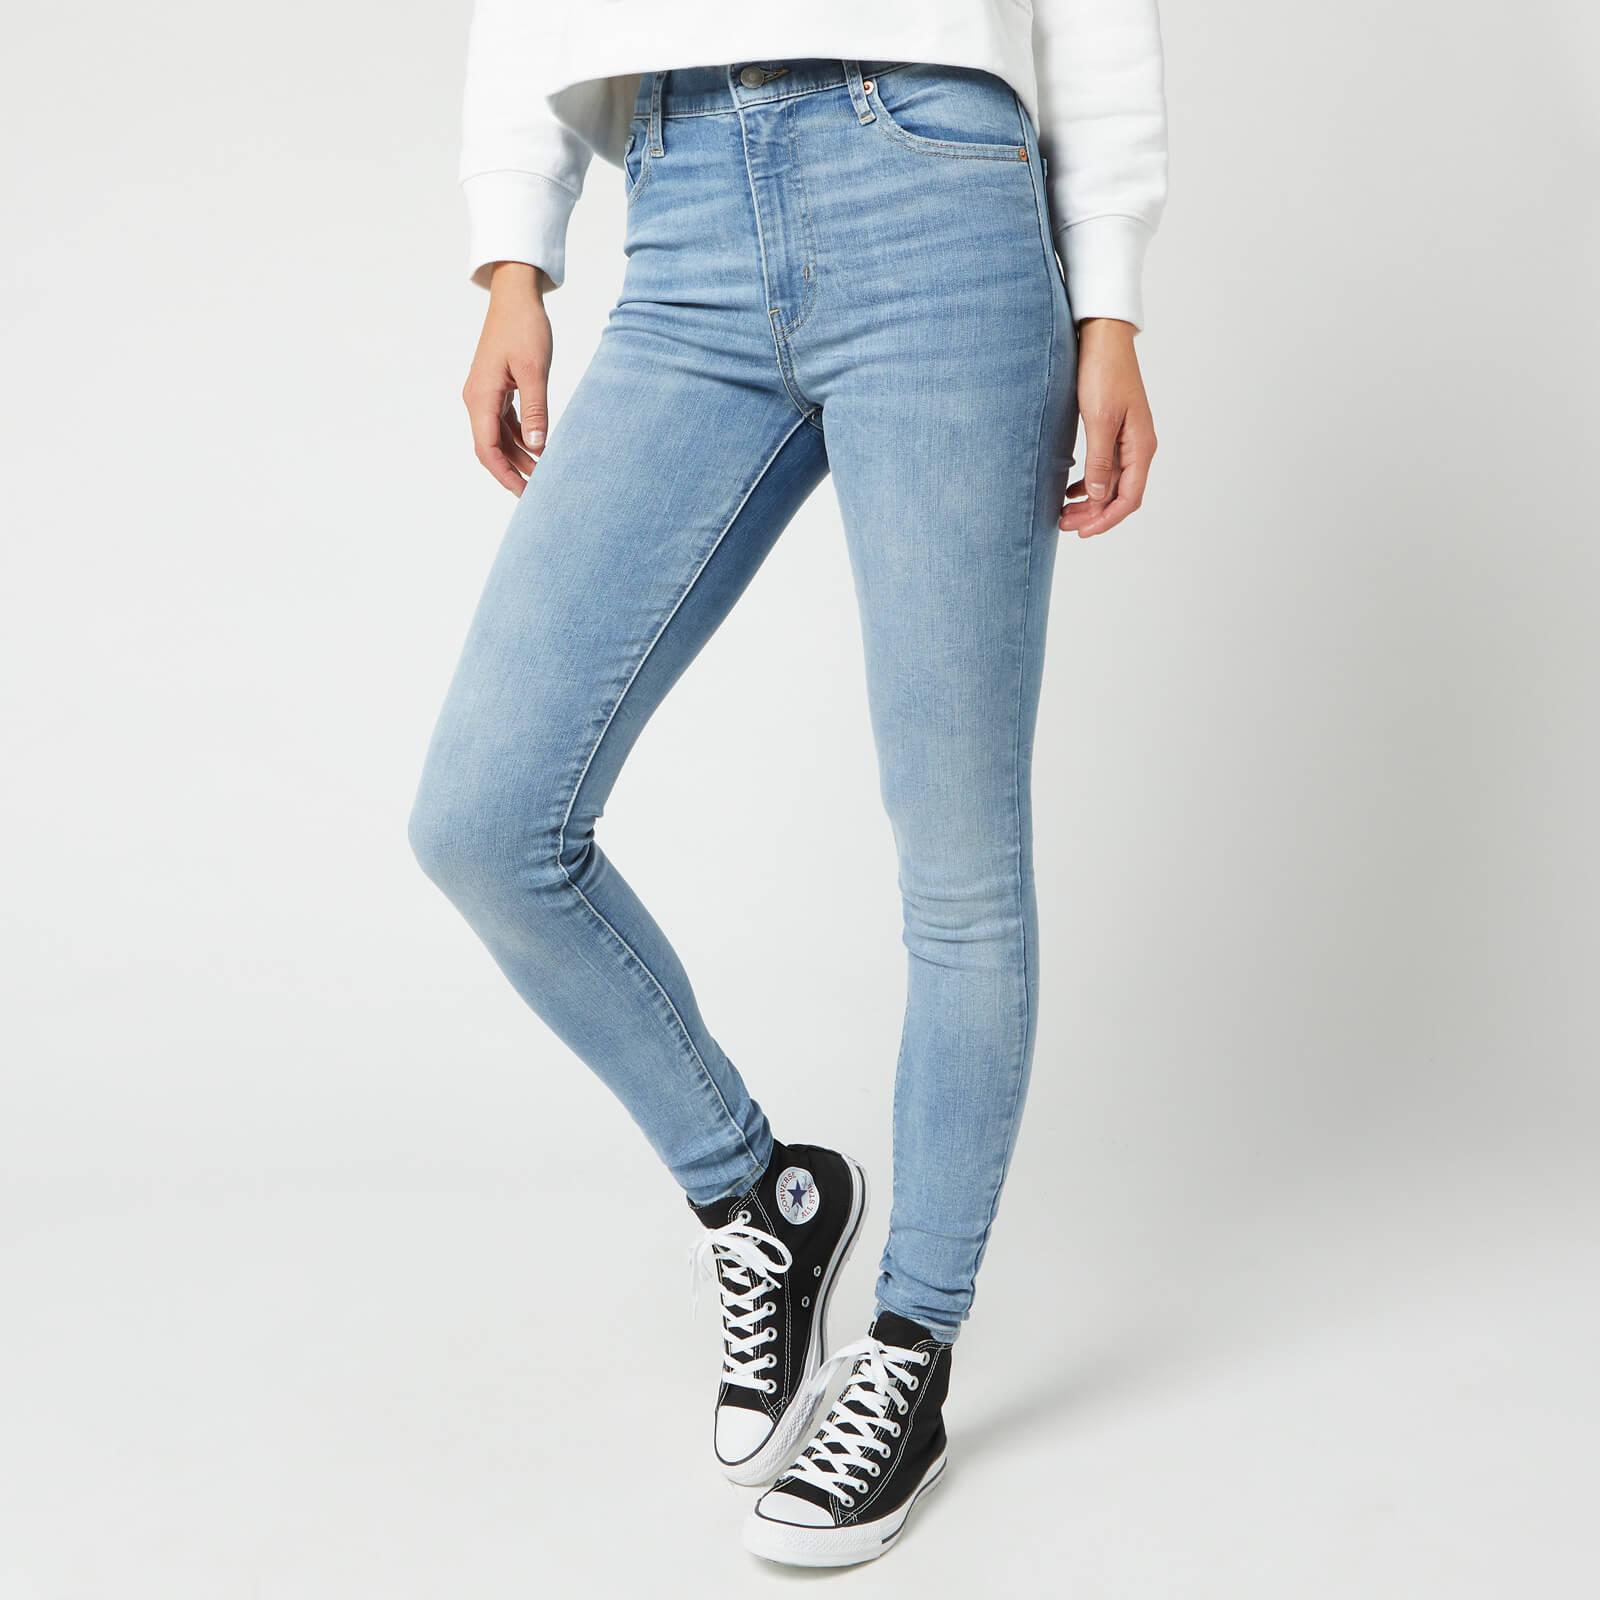 Levi's s Mile High Super Skinny Jeans - You Got Me - W26/L32